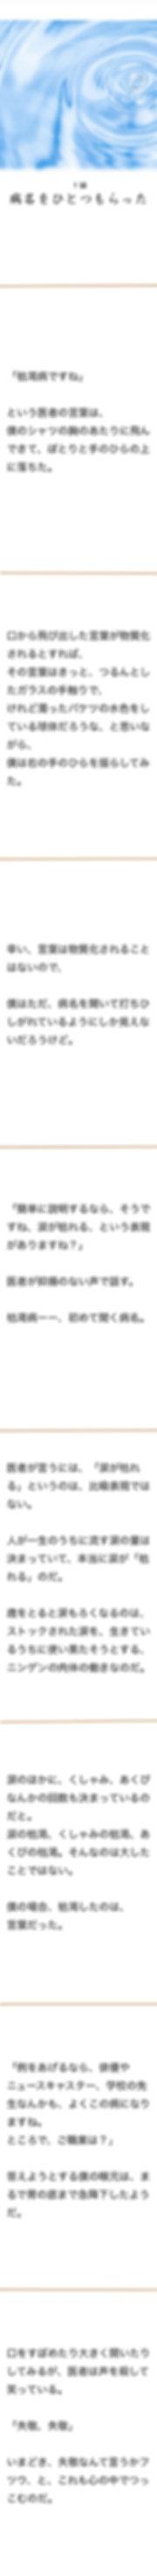 1-9_a.jpg